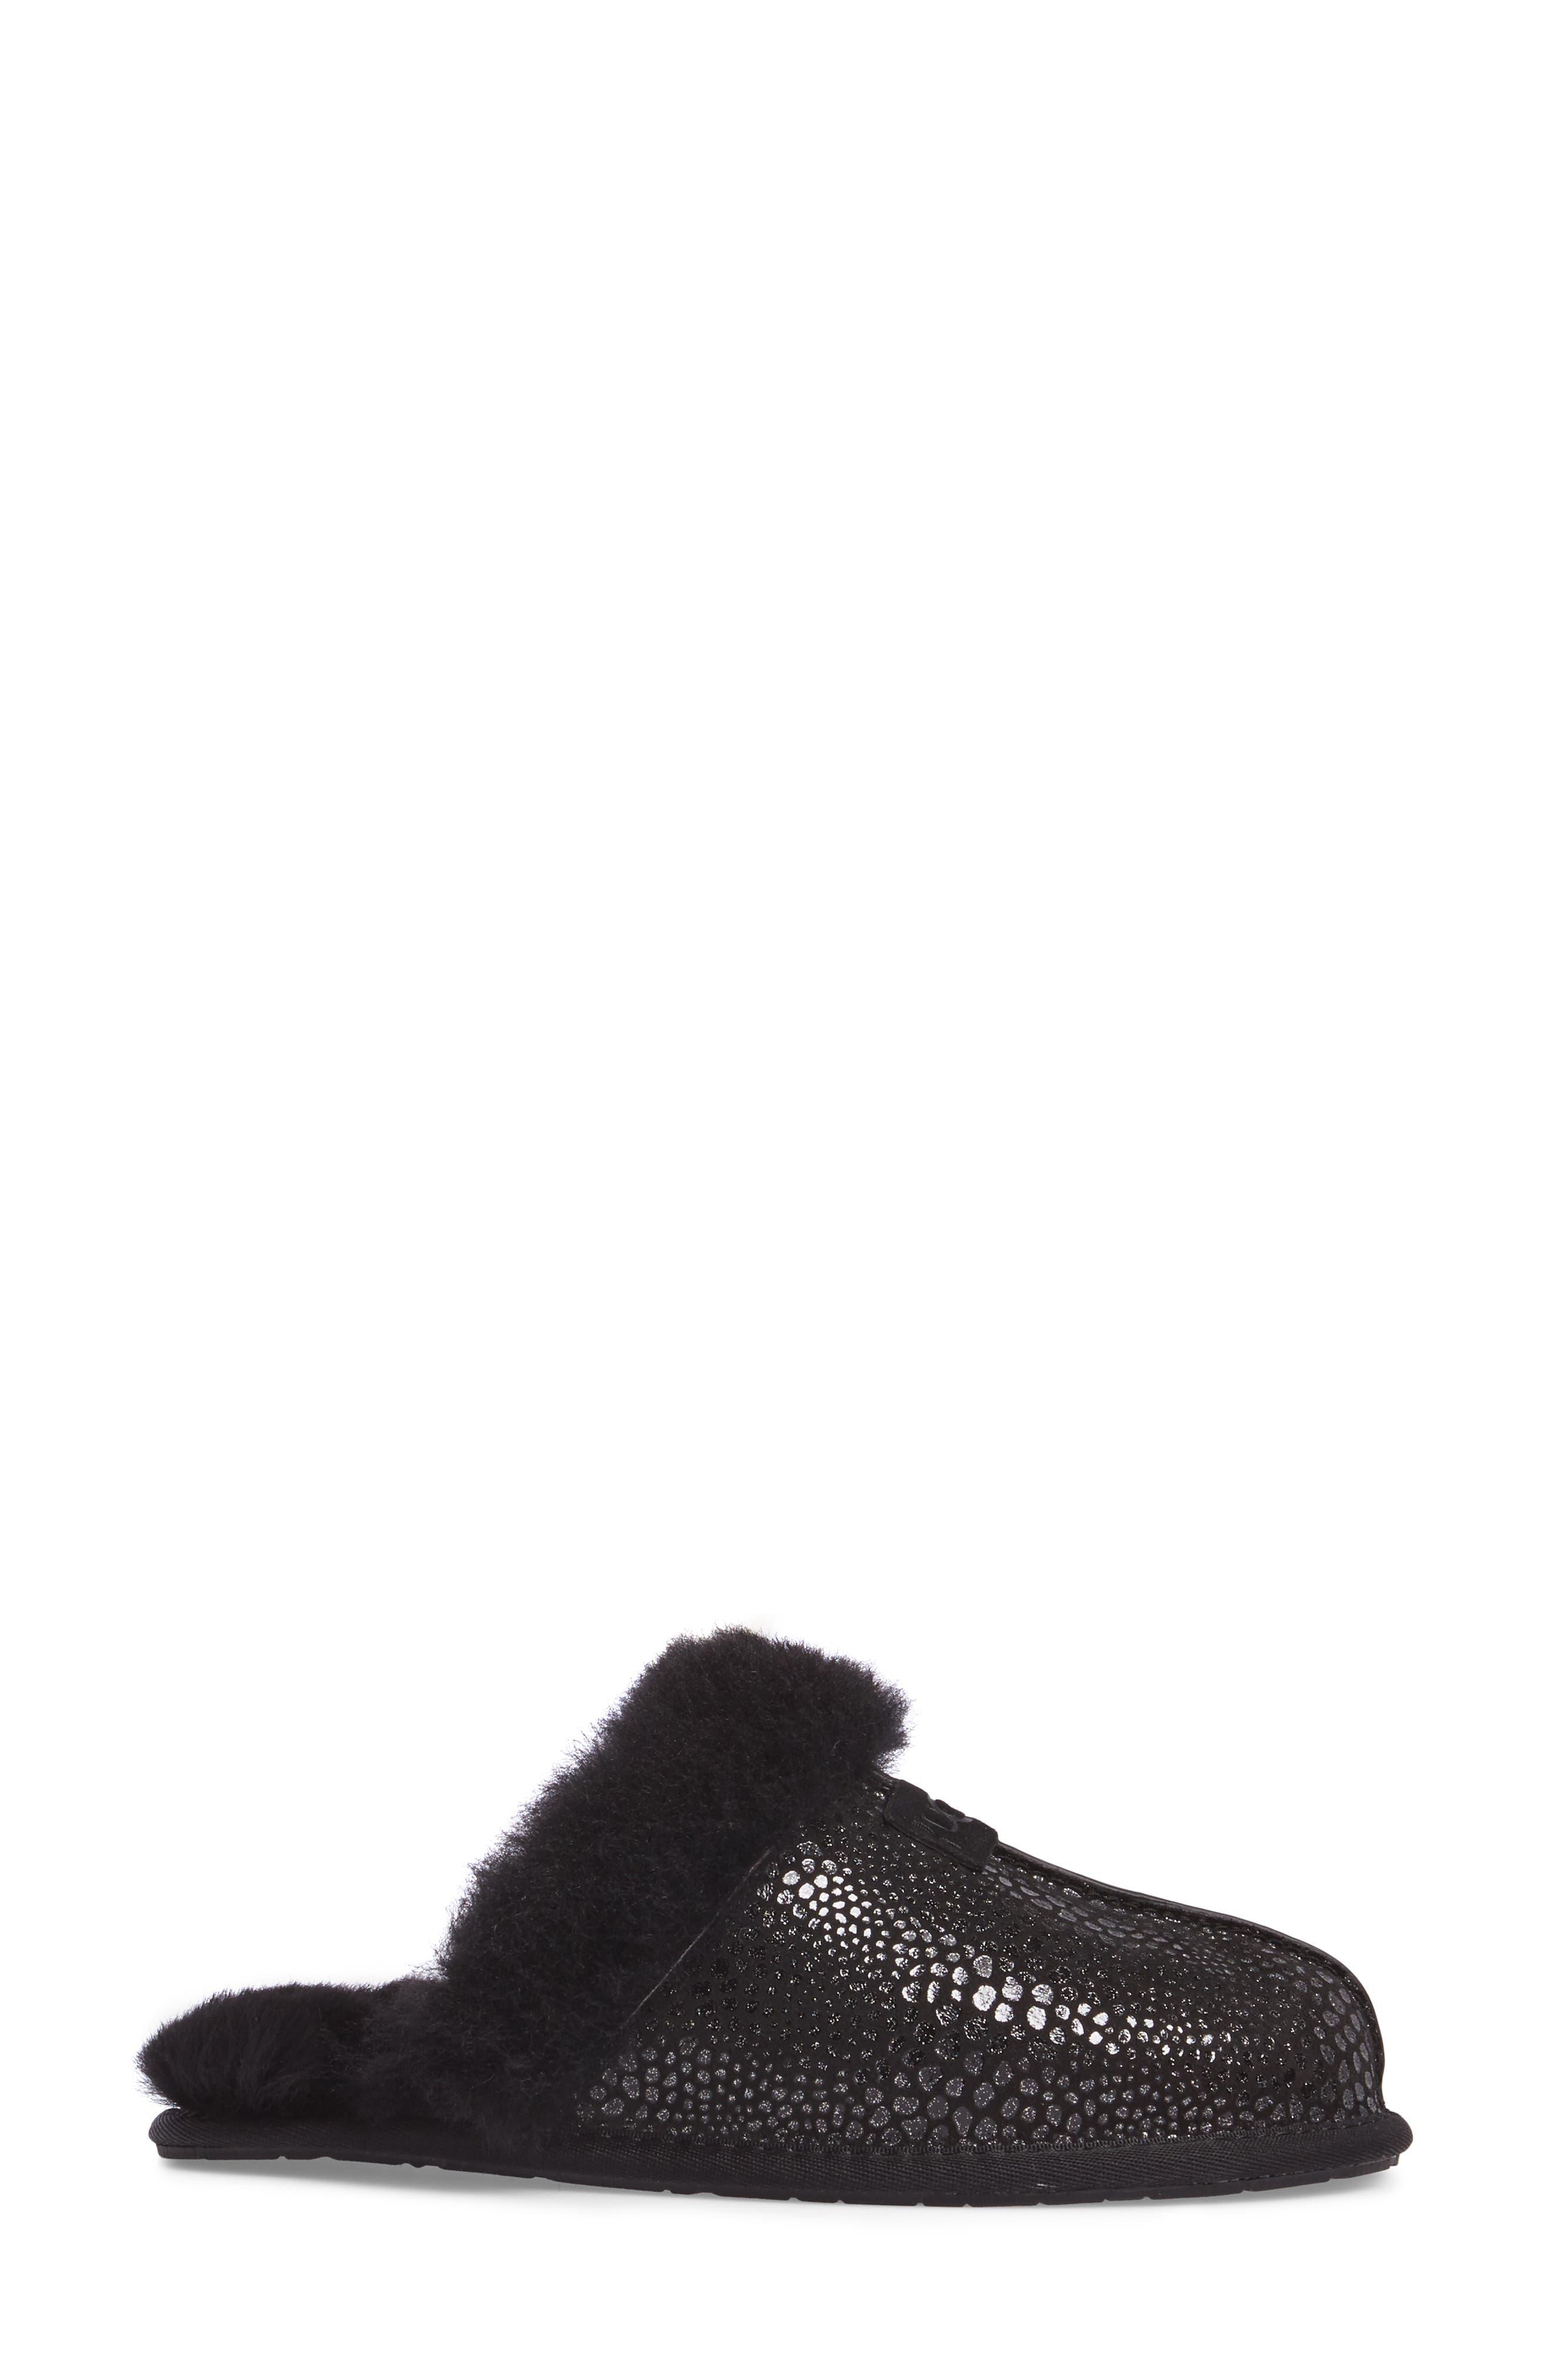 Alternate Image 3  - UGG® Scuffette II Glitzy Slipper (Women)